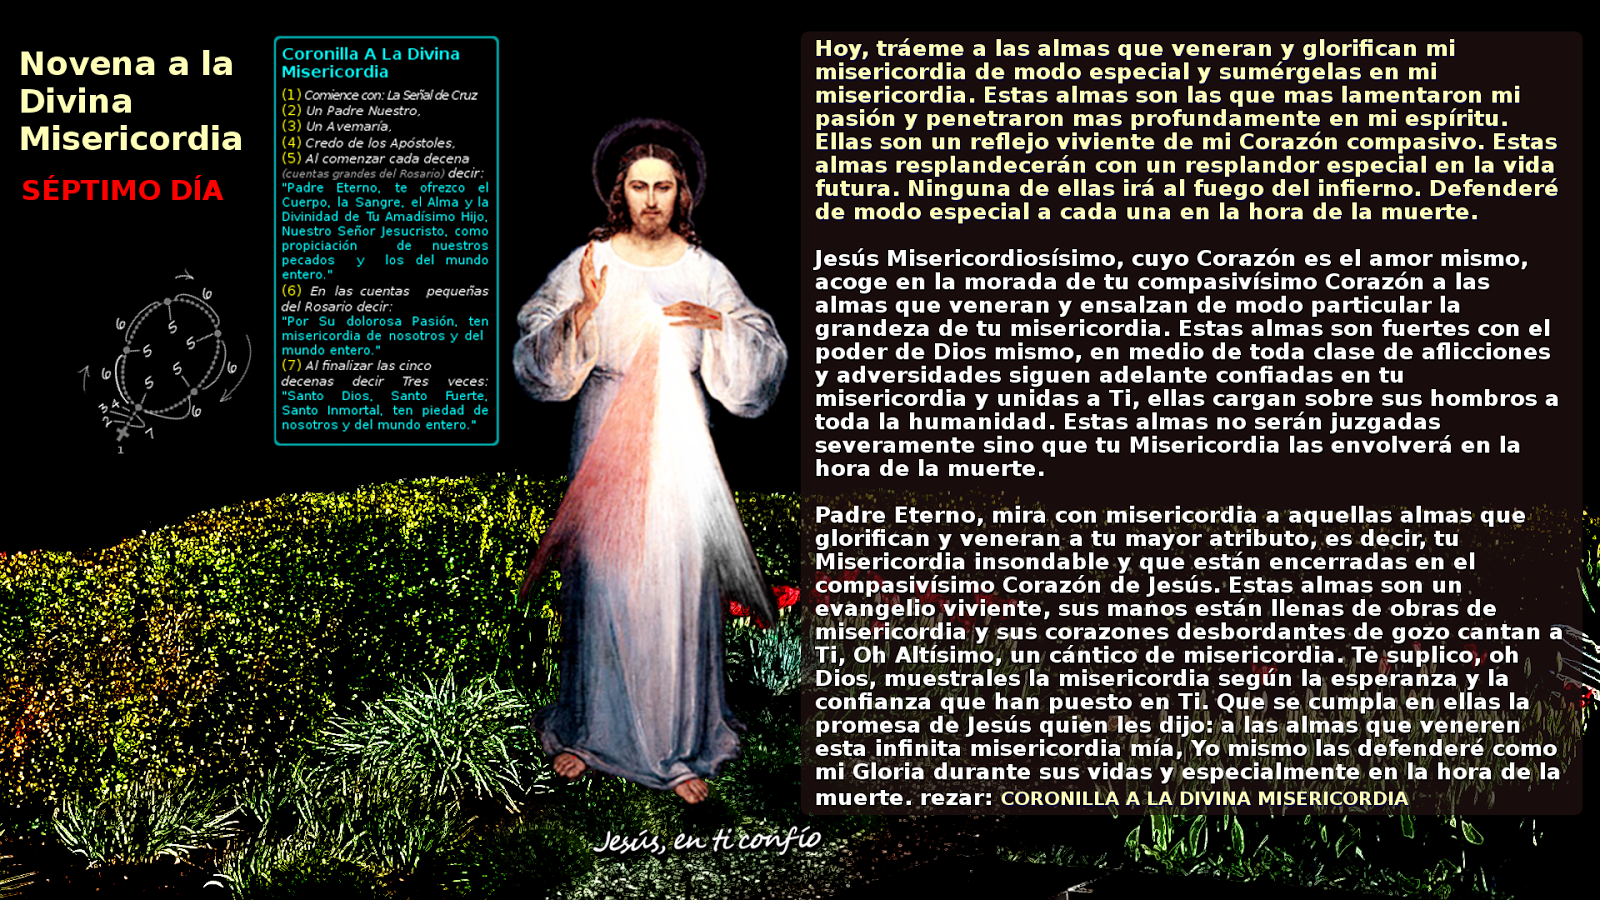 SÉPTIMO DÍA de la novena a la divina misericordia